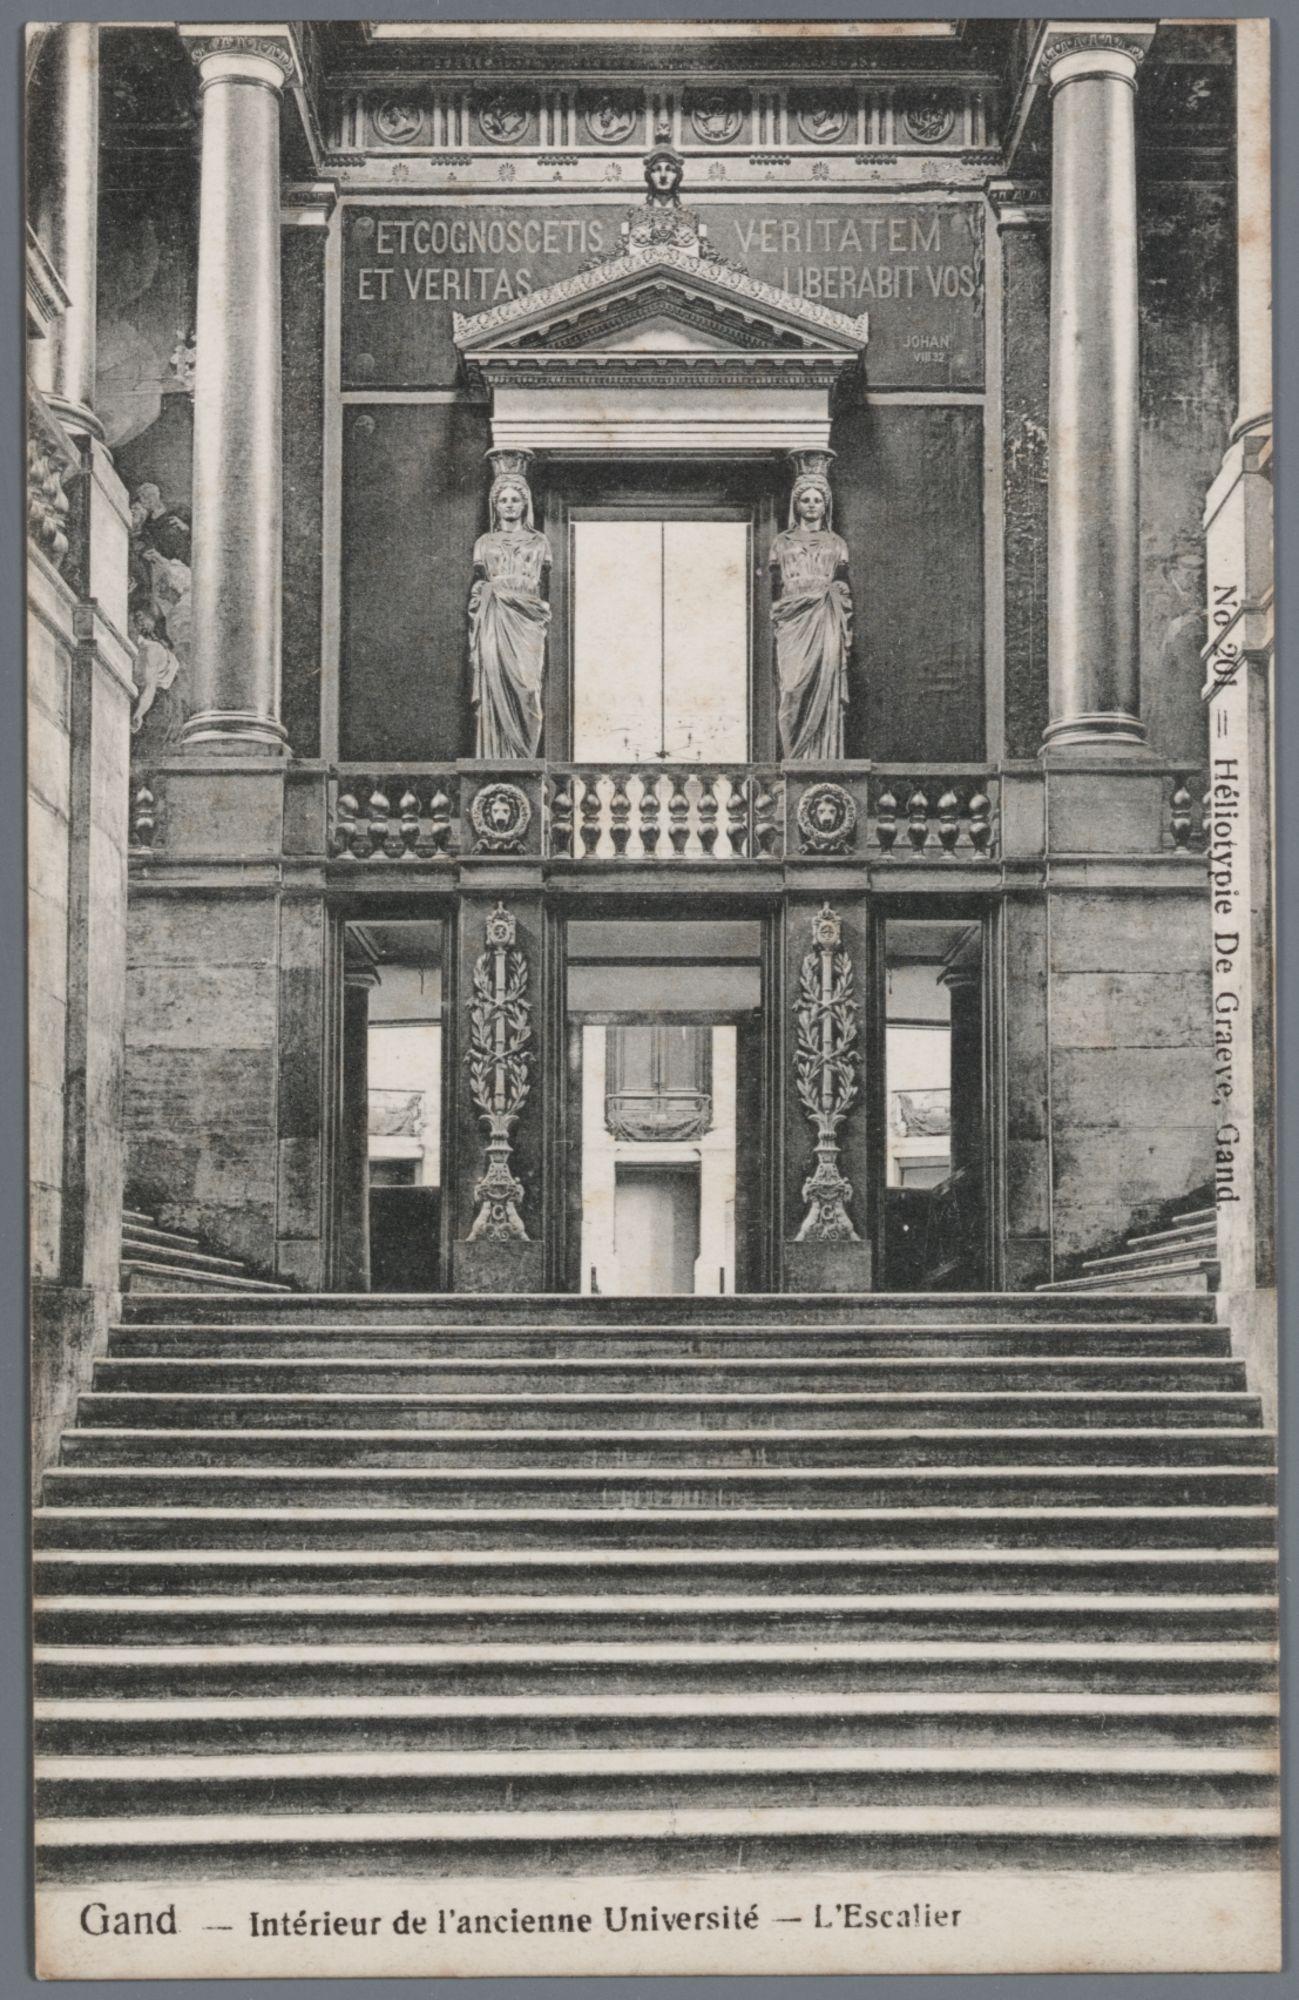 Gent: Voldersstraat: Aula Universiteit: binnenzicht